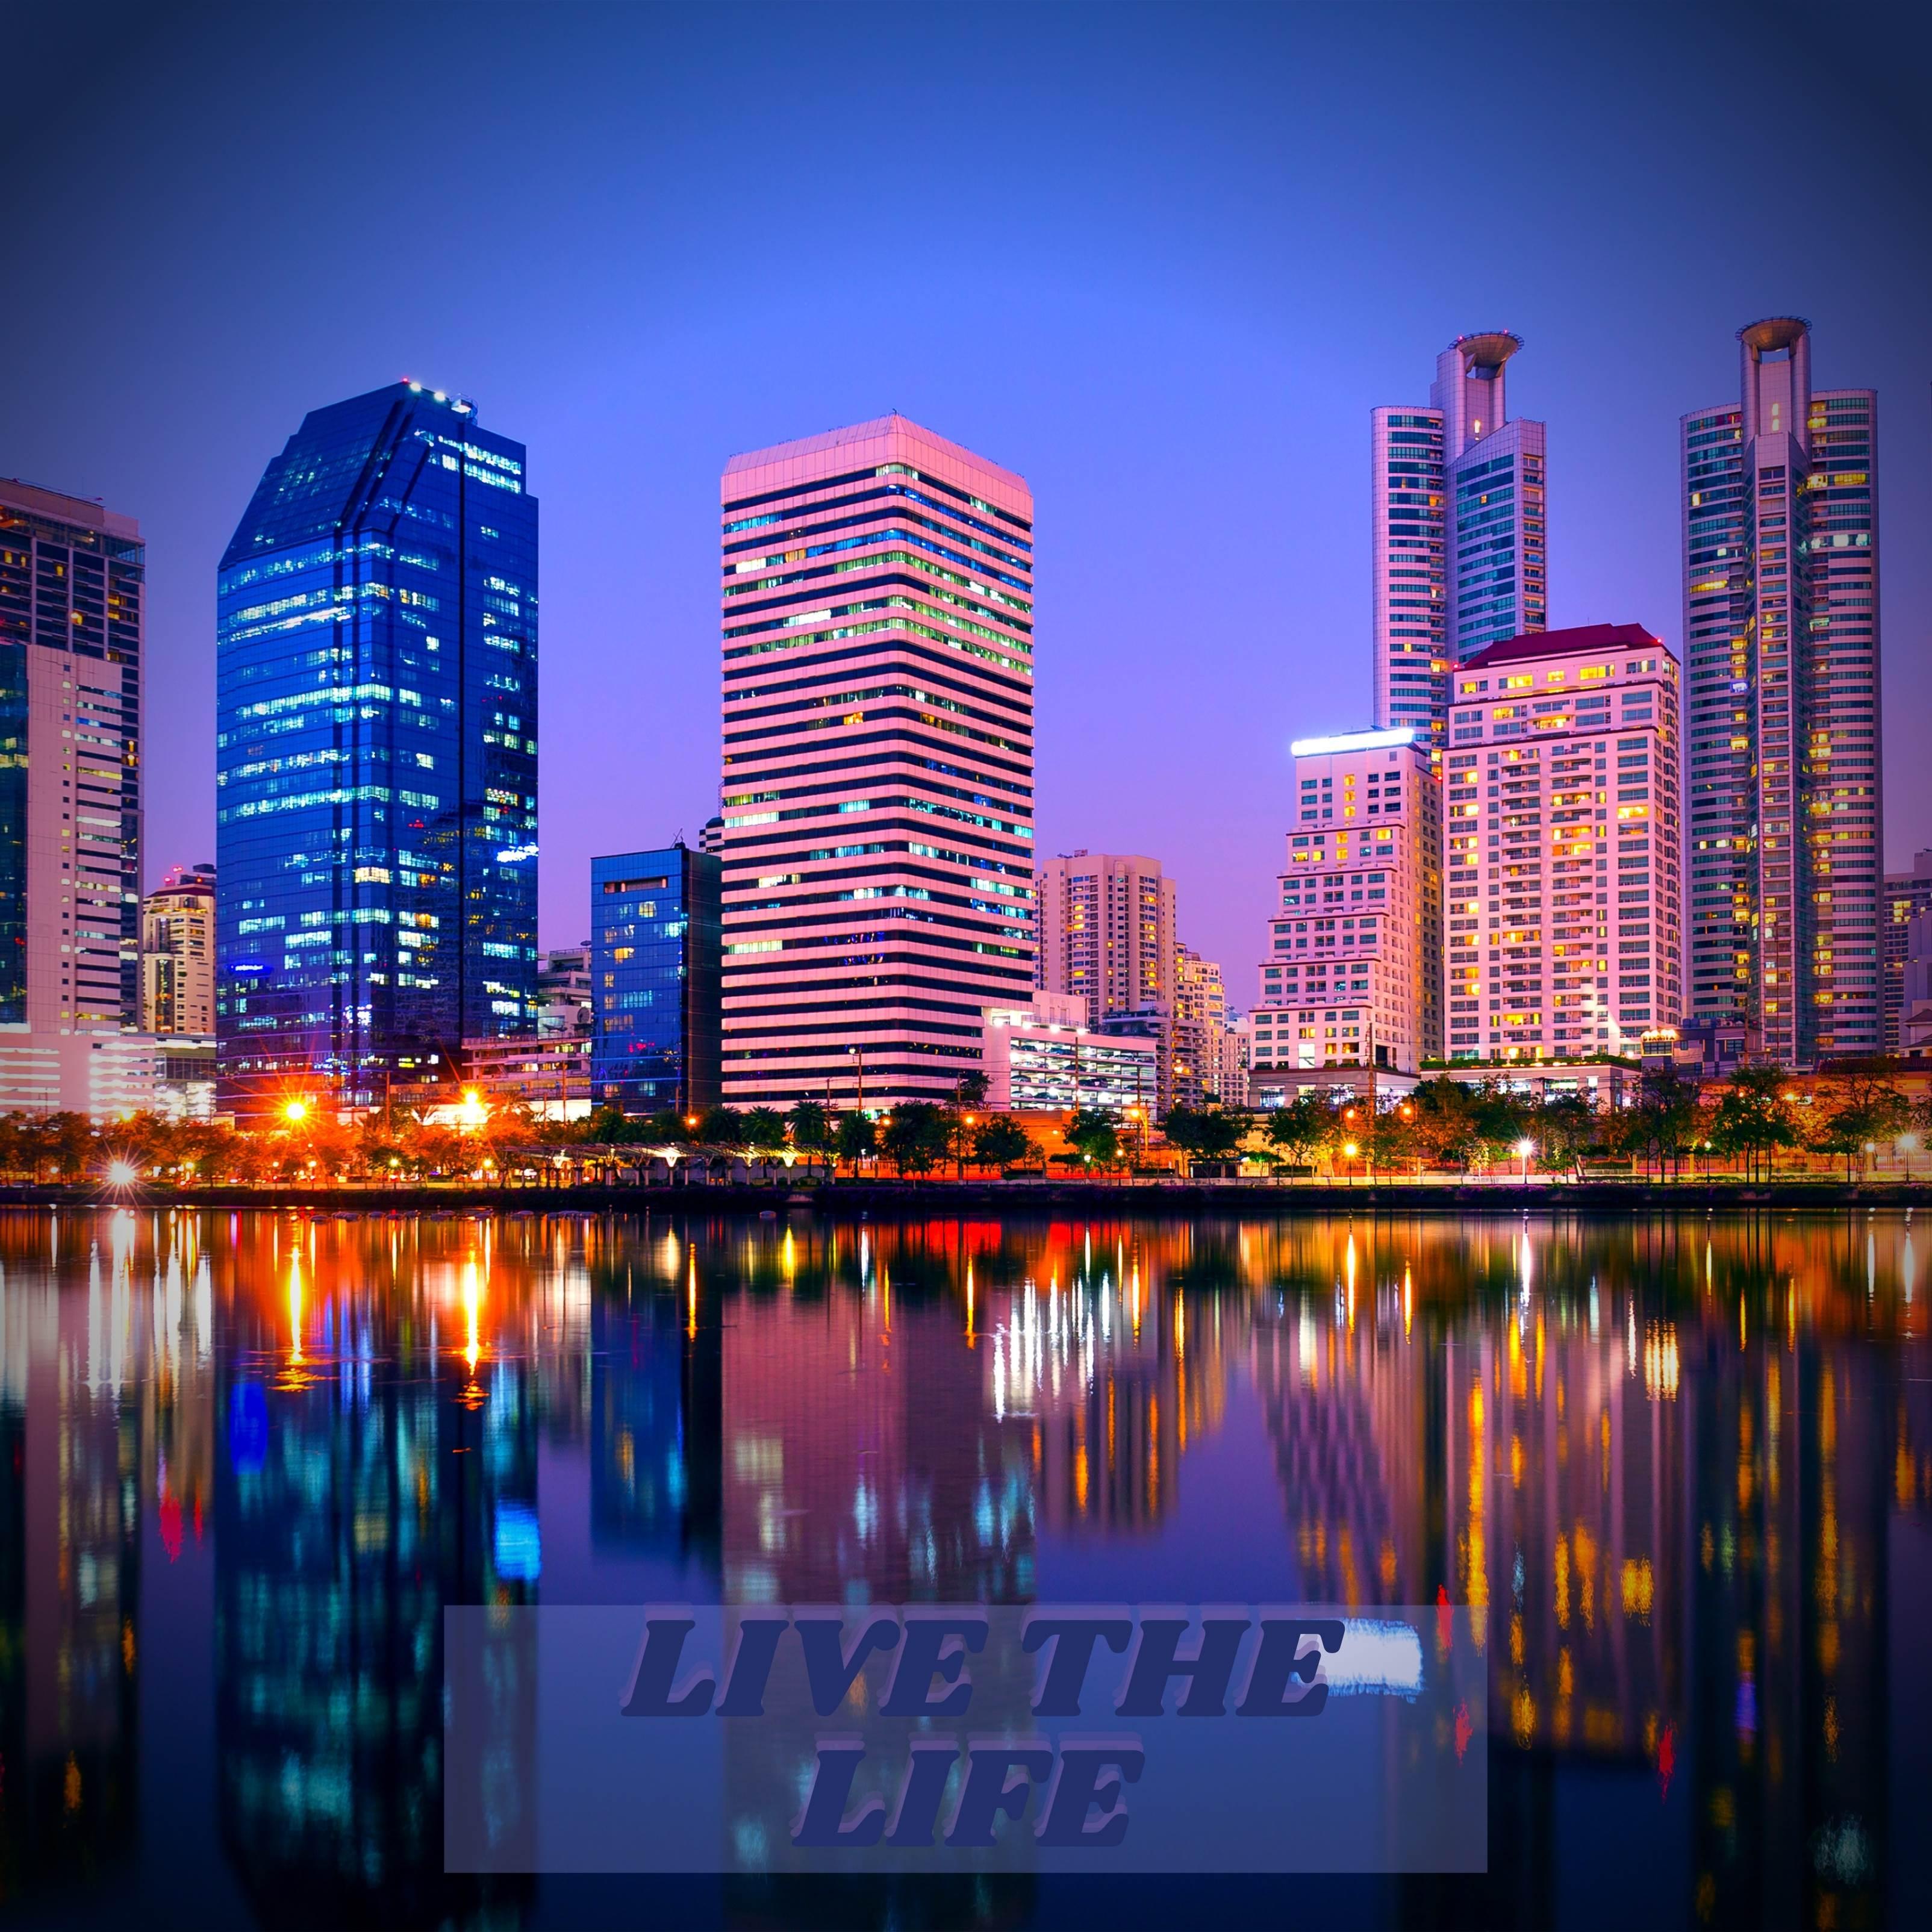 Bangkok City Skyscraper River Reflection iPad Wallpaper